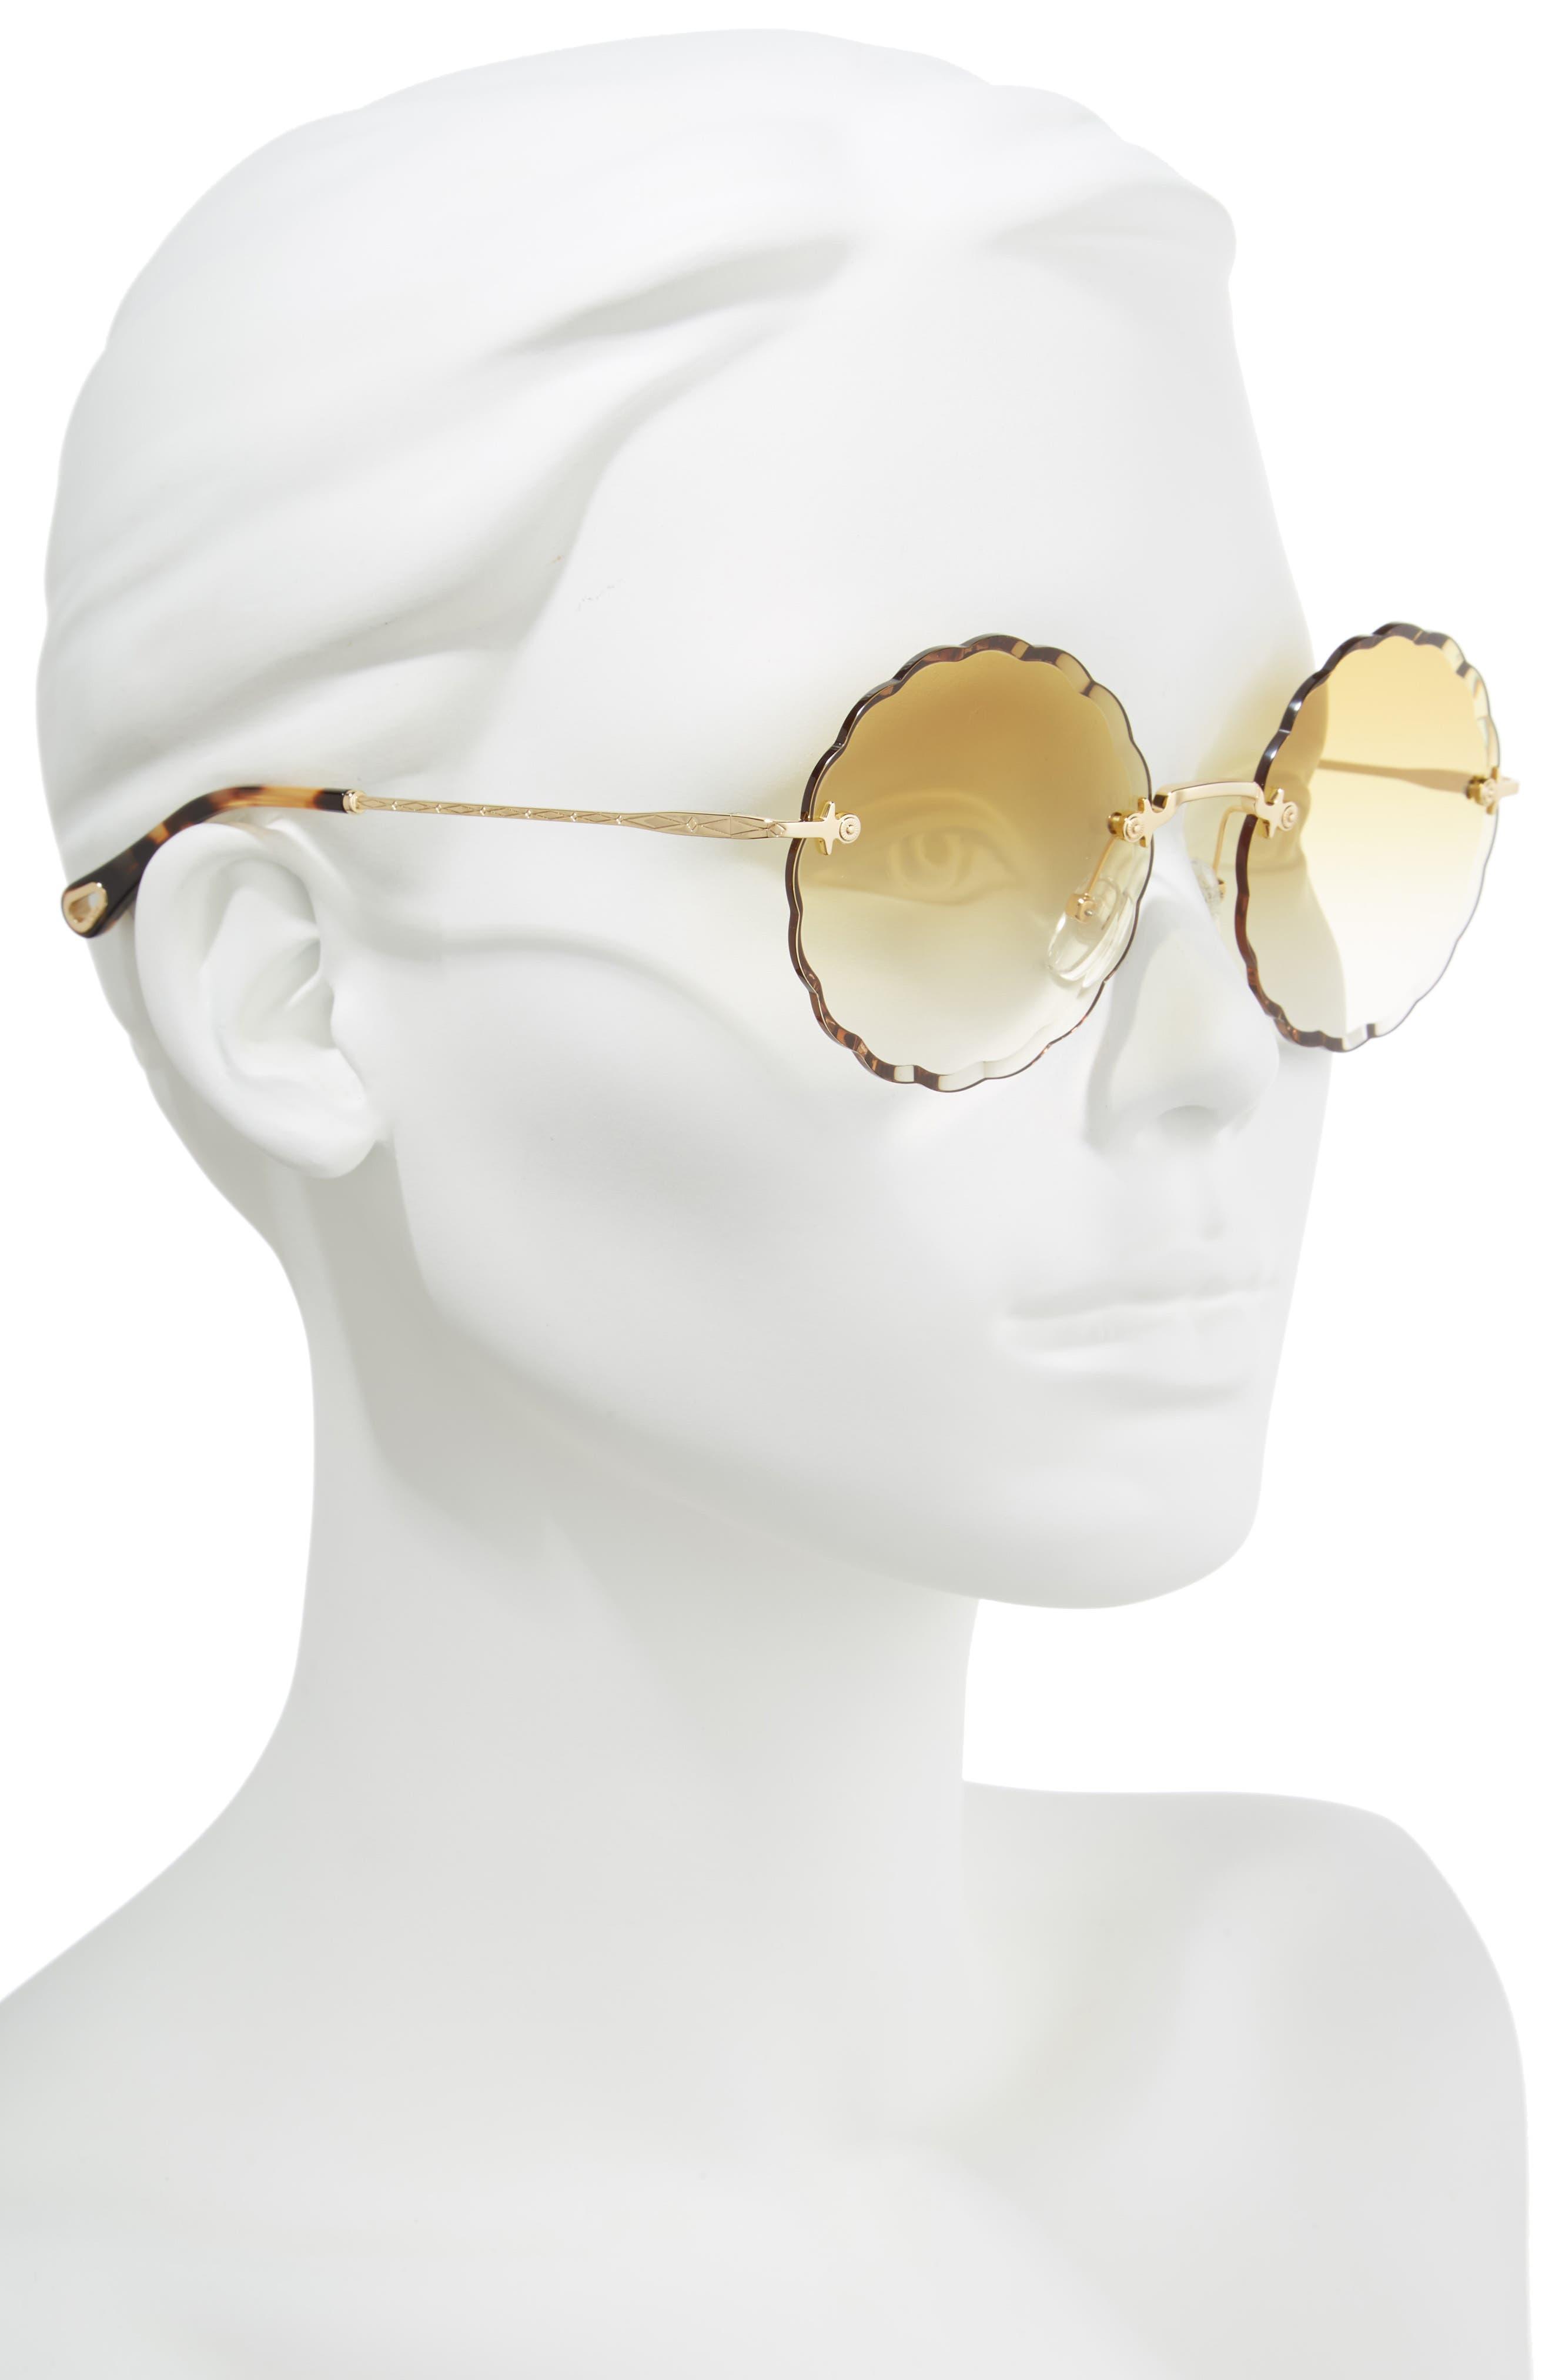 Rosie 60mm Scalloped Rimless Sunglasses,                             Alternate thumbnail 2, color,                             Gold/ Gradient Ochre